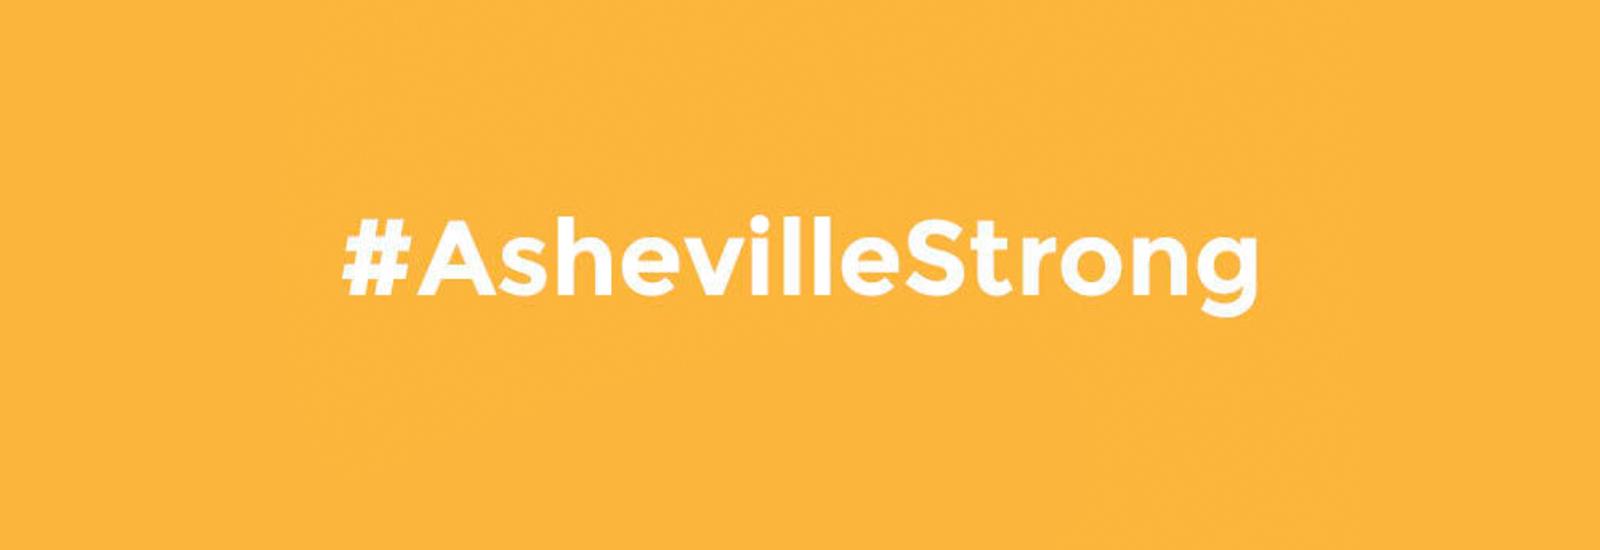 AshevilleStrong Community